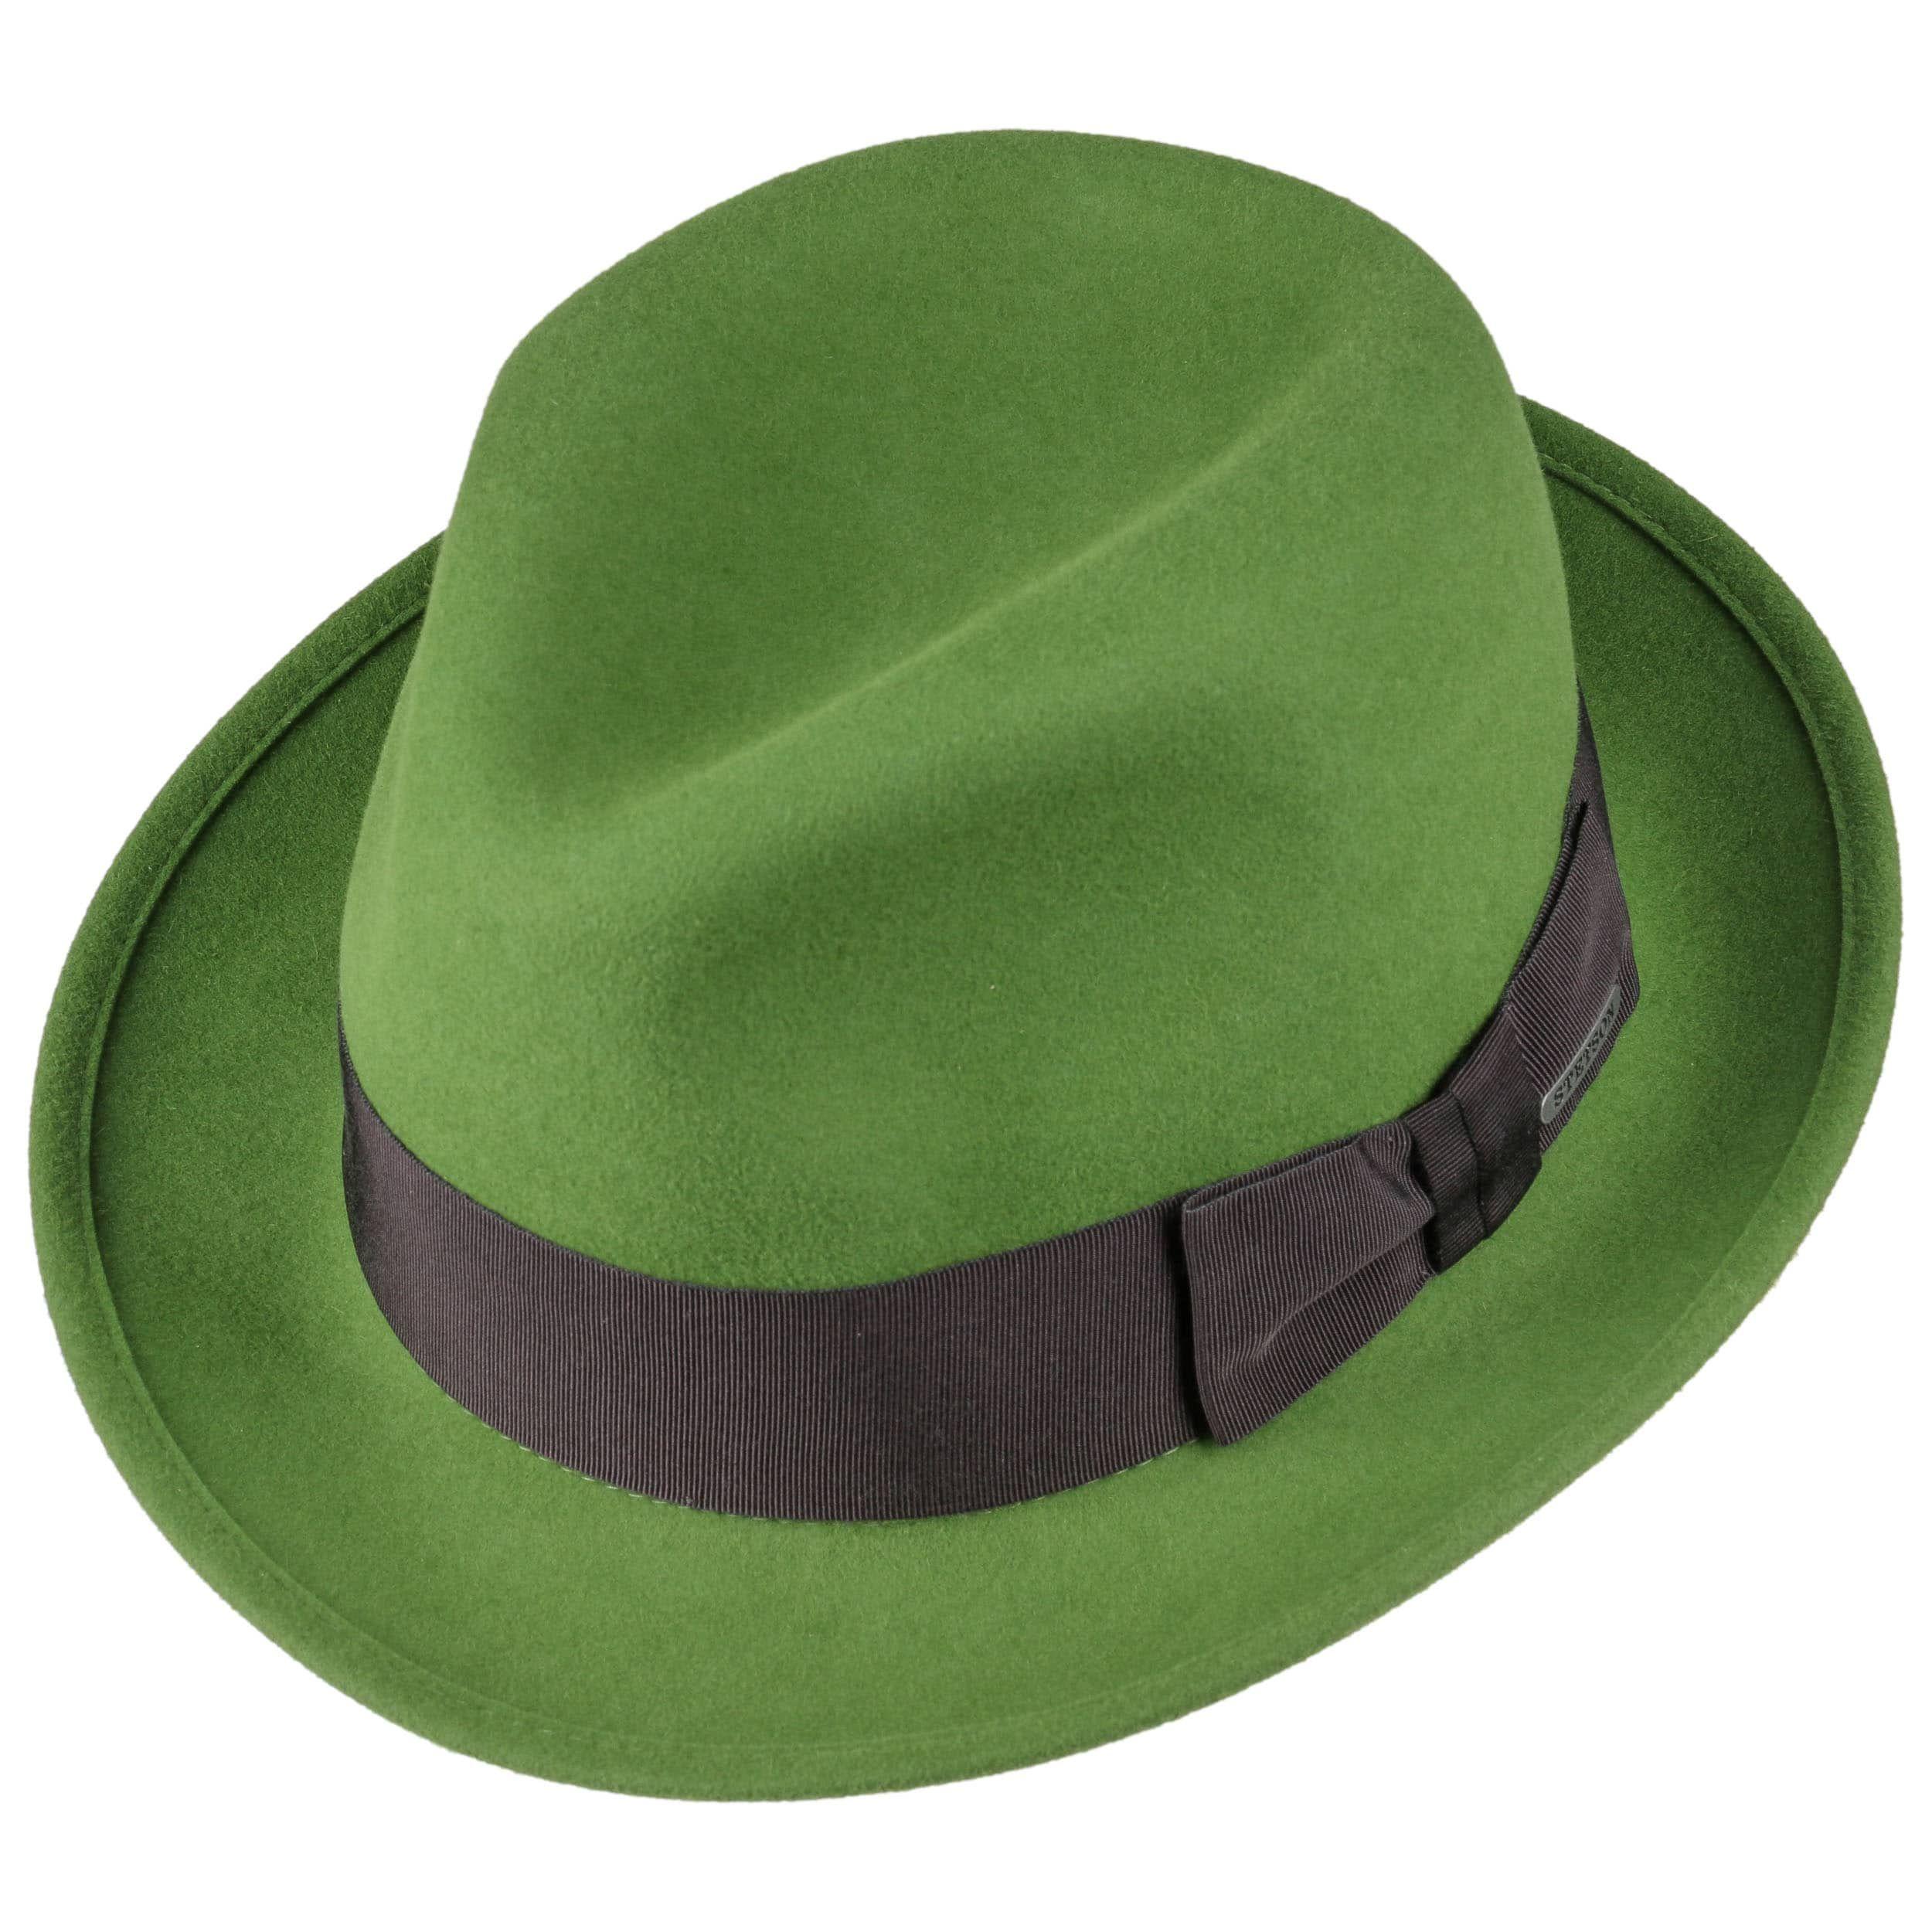 Marico Player Haarvilthoed groen